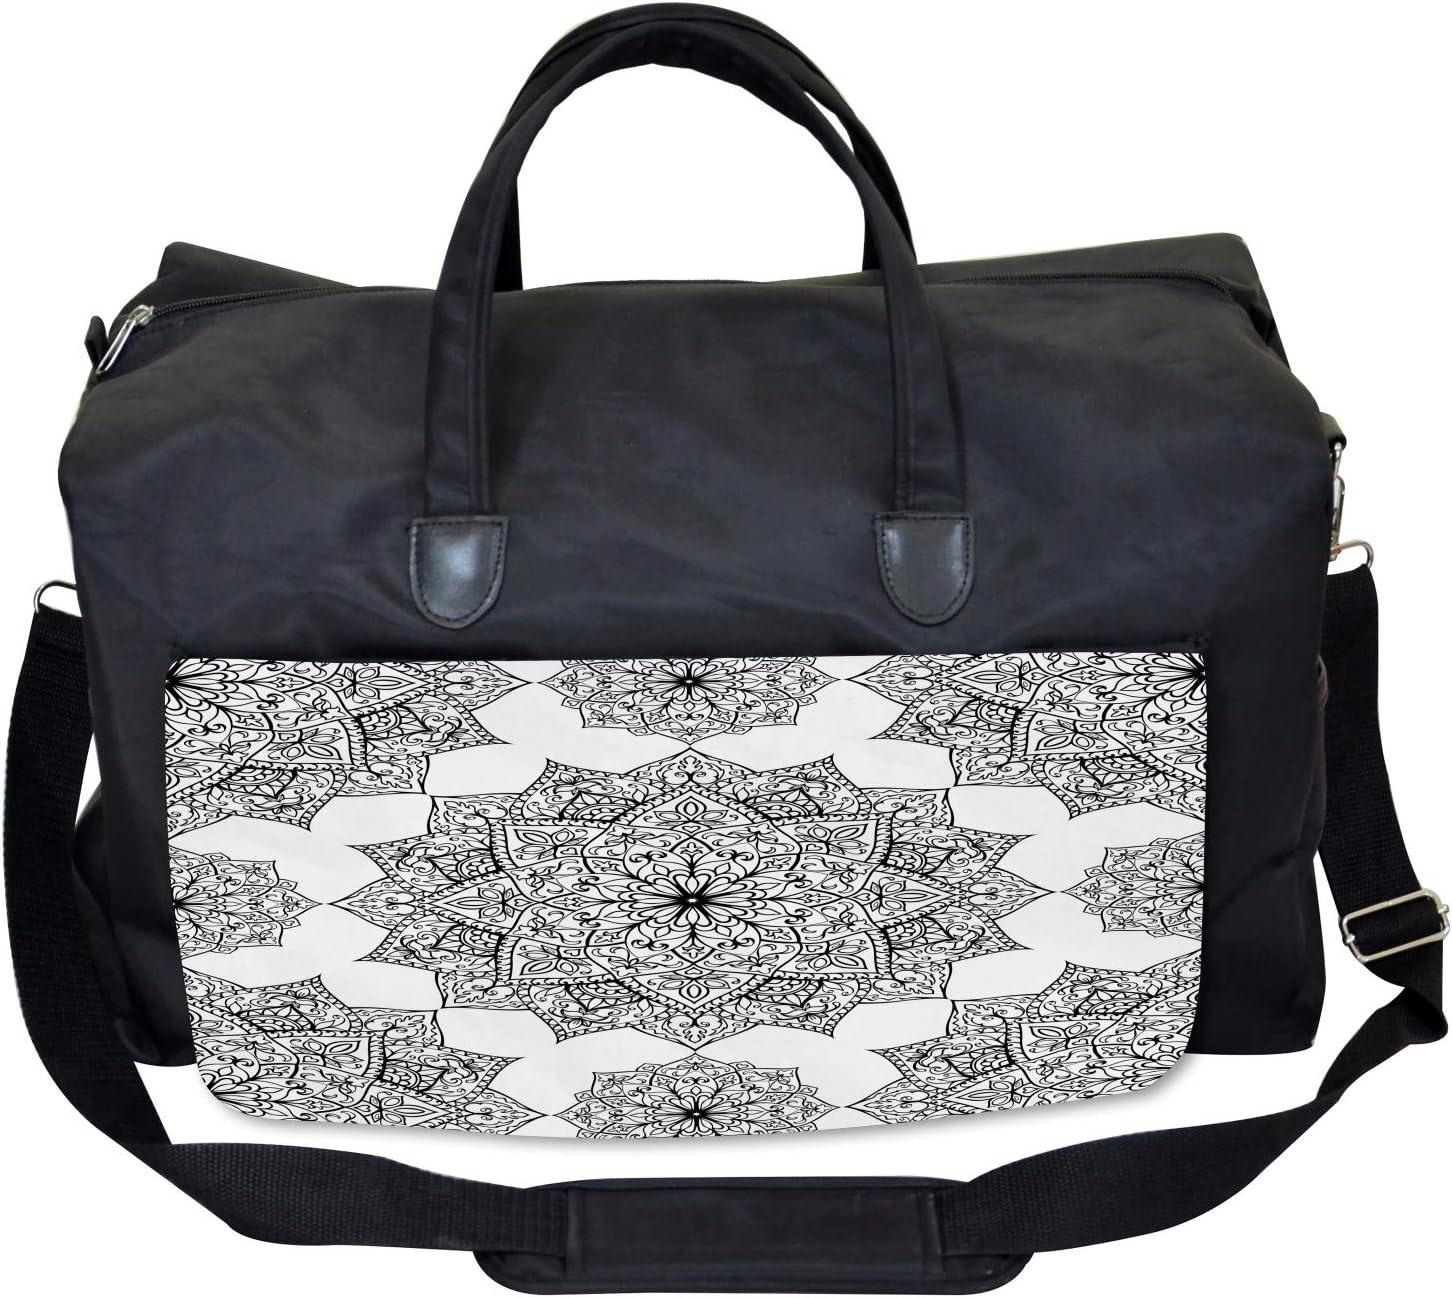 Large Weekender Carry-on Ambesonne Black Gym Bag Eastern Mosaic Patterns